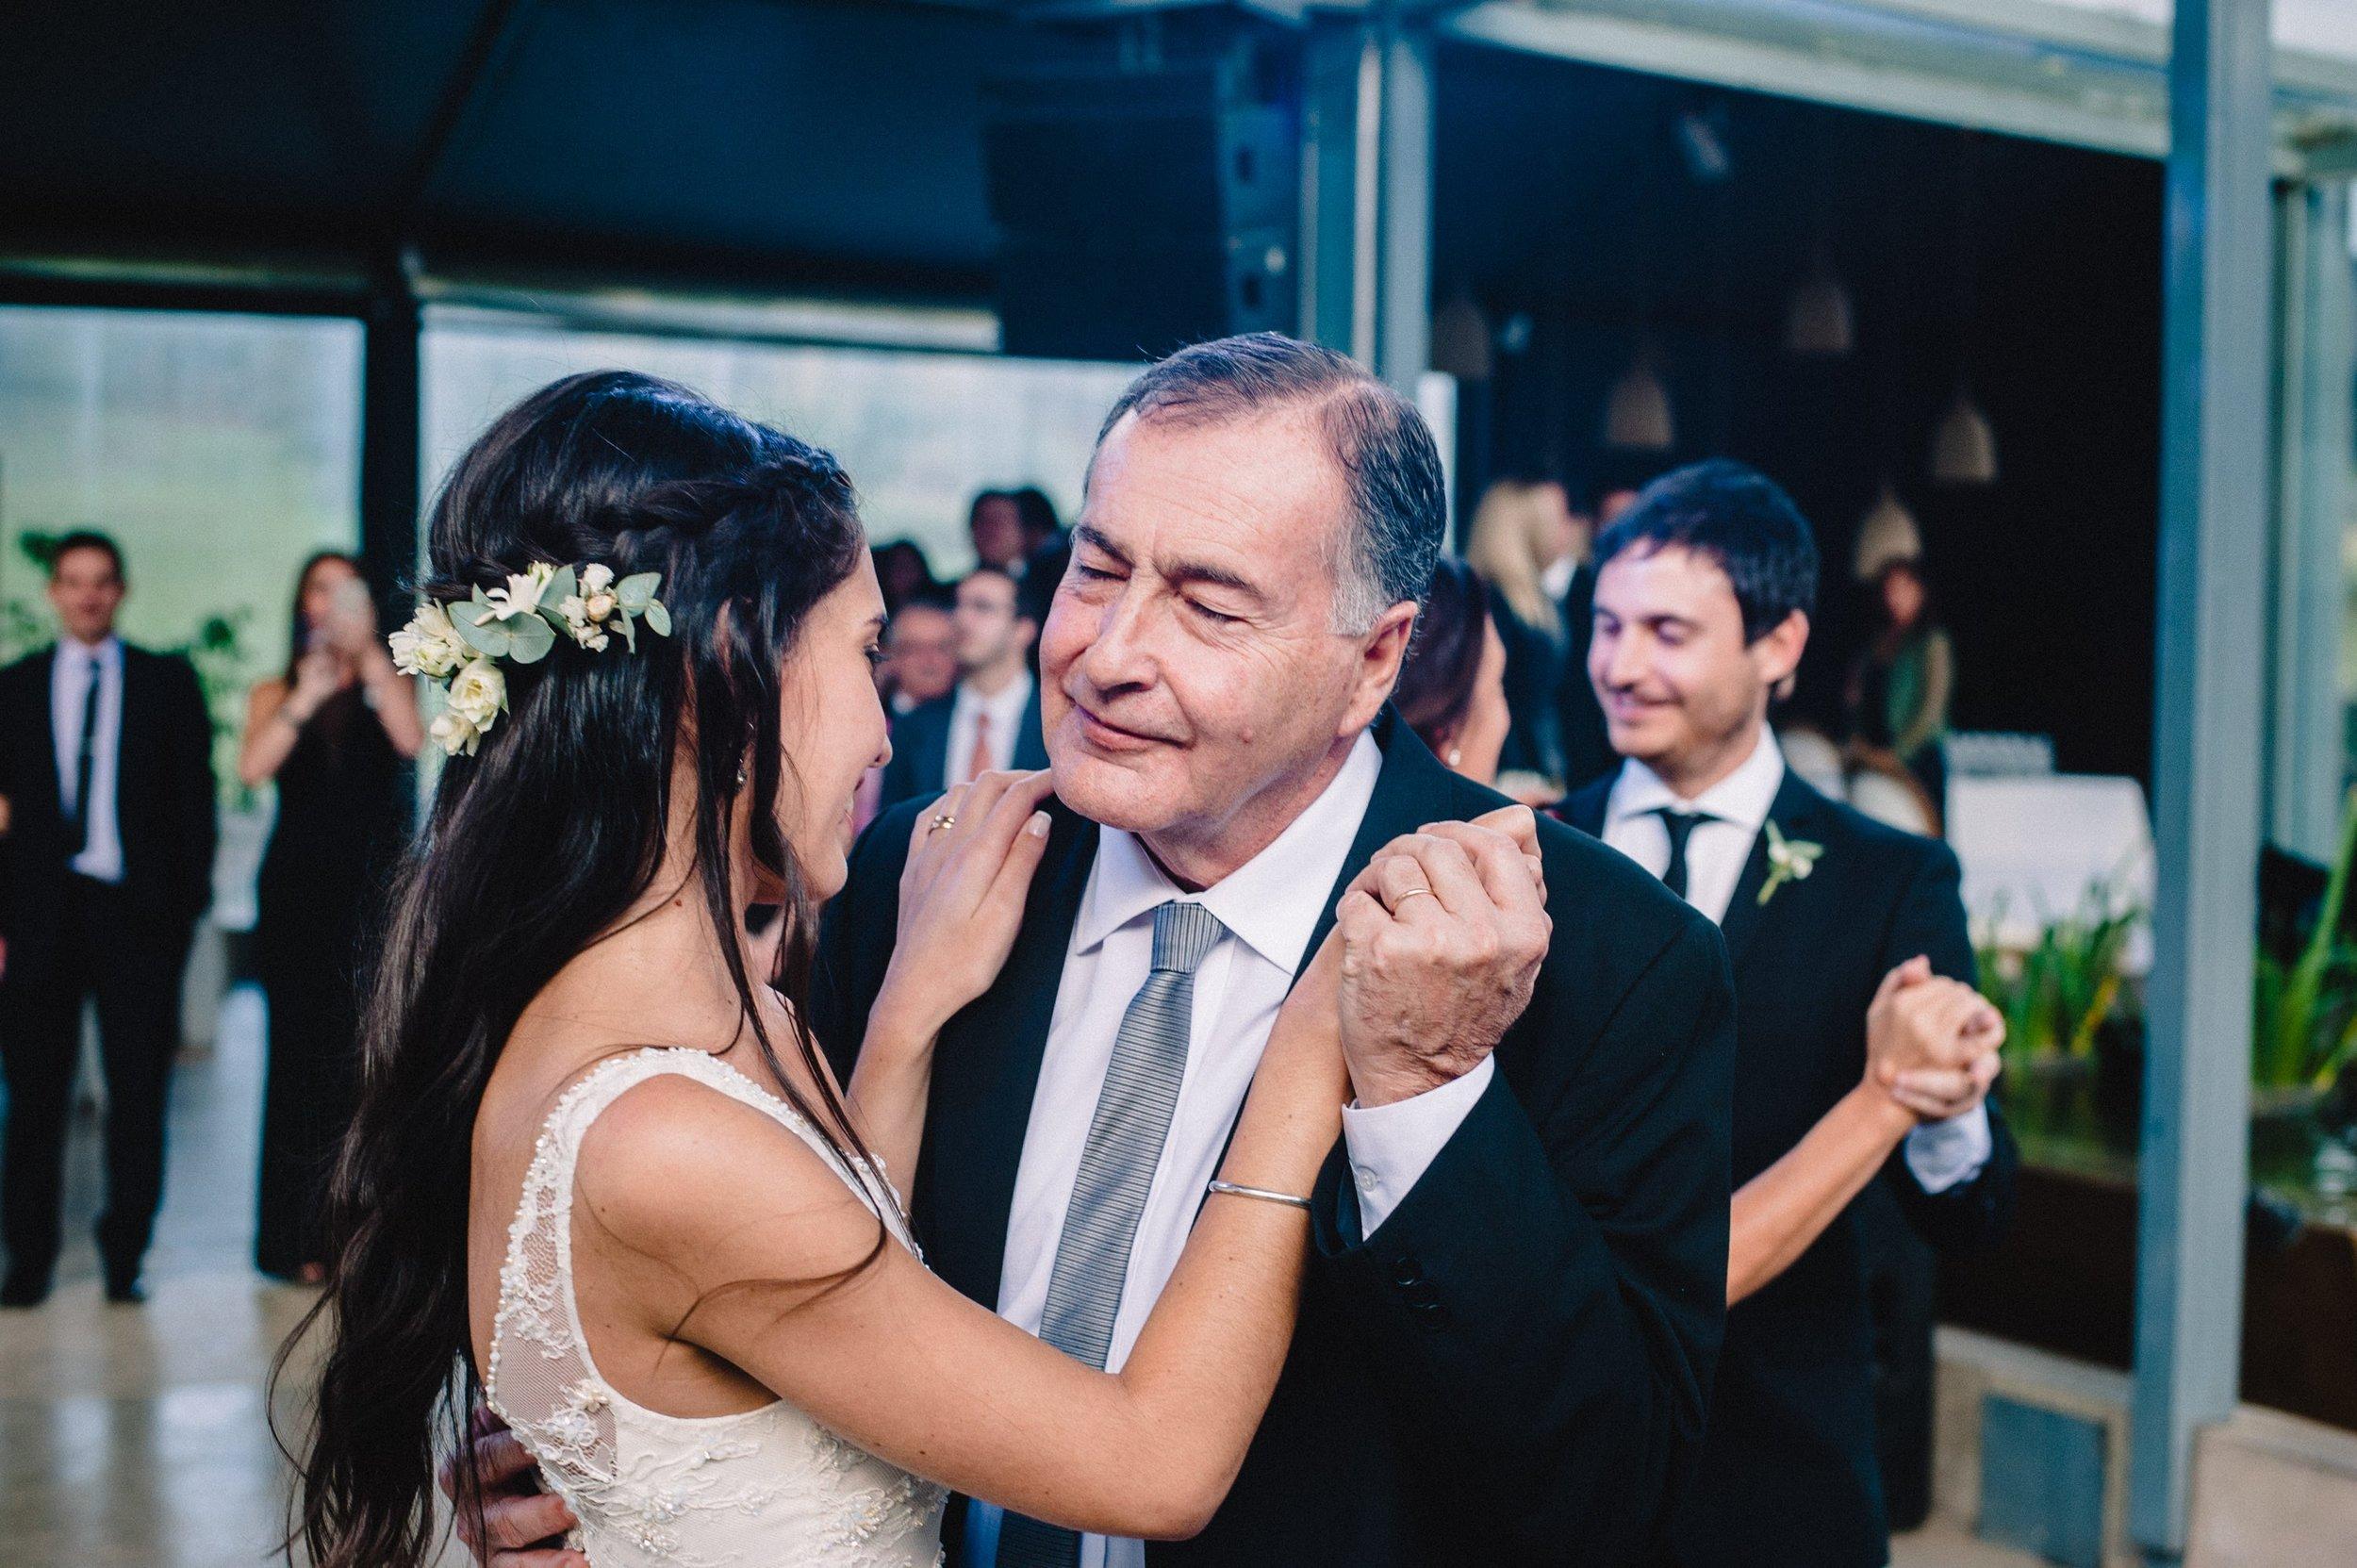 fotografo de bodas en carlos paz cordoba 066.JPG